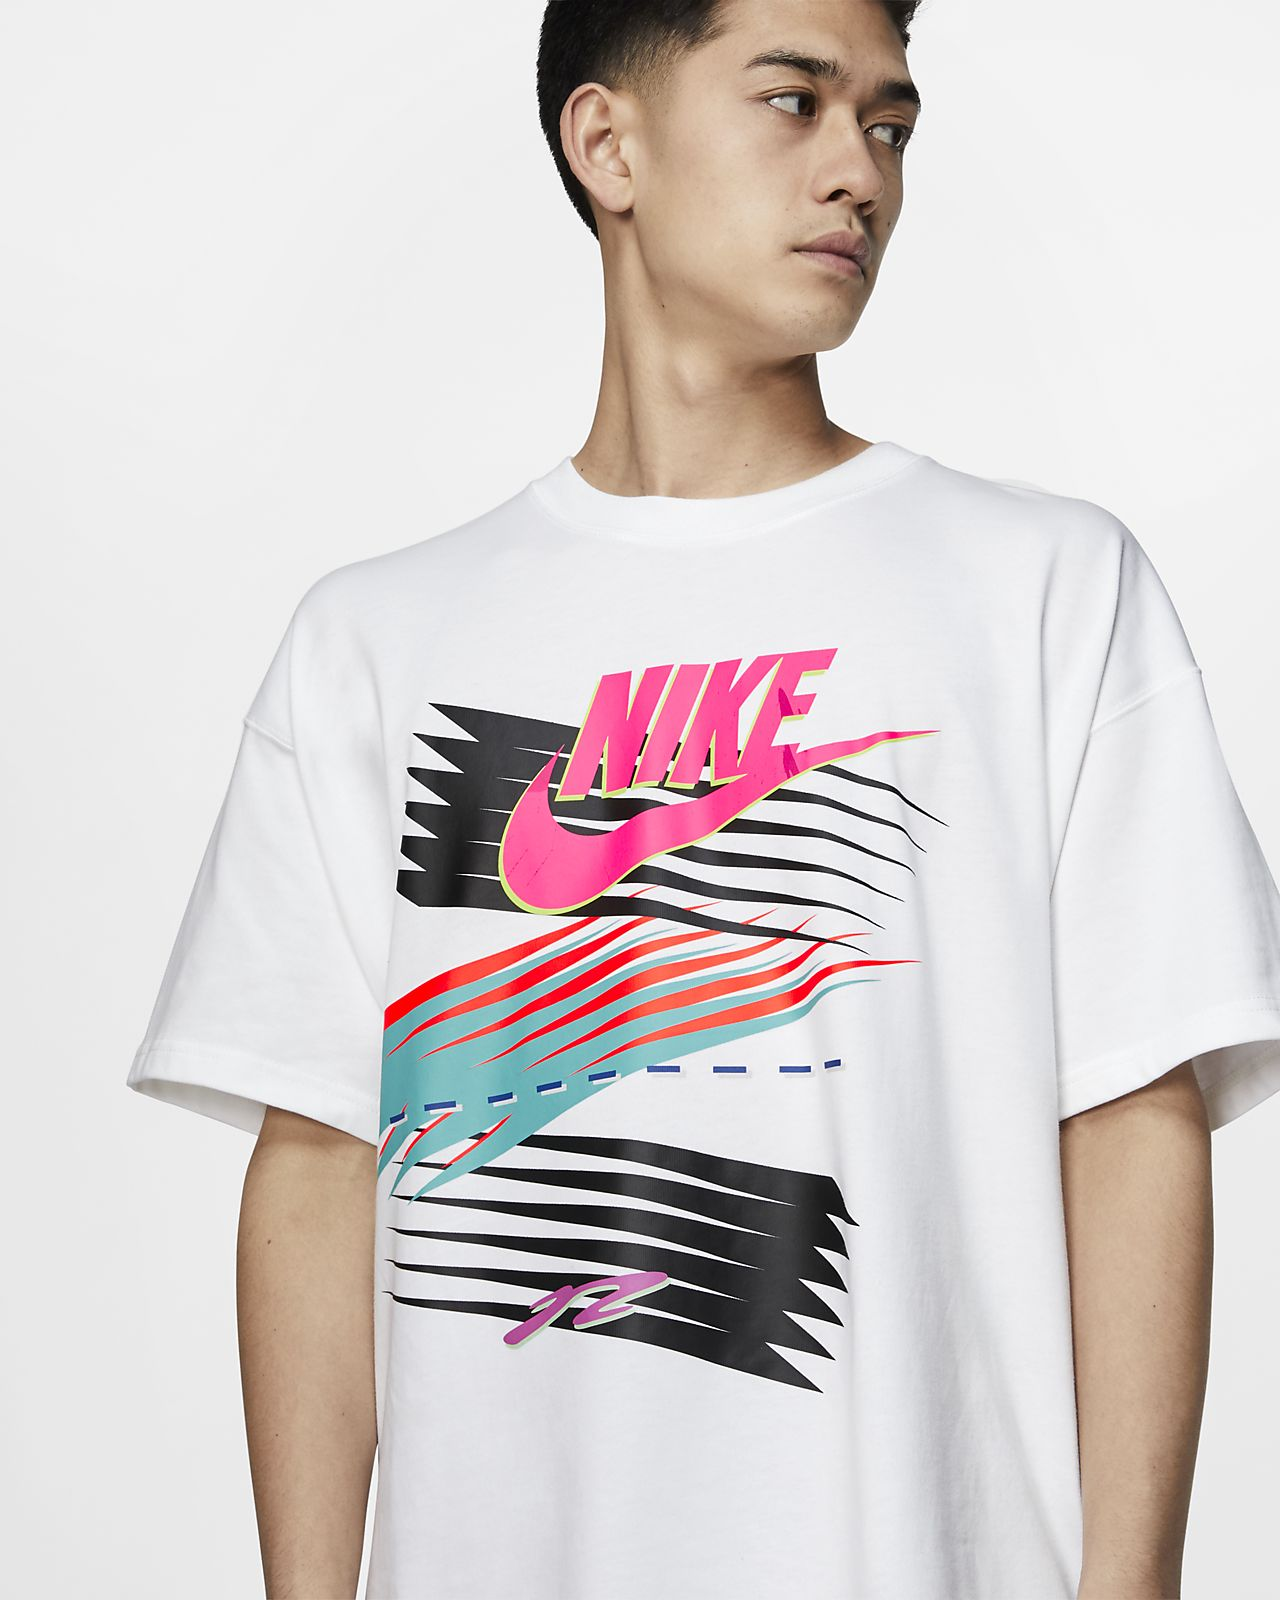 92820d574808 Nike x atmos Men s T-Shirt. Nike.com